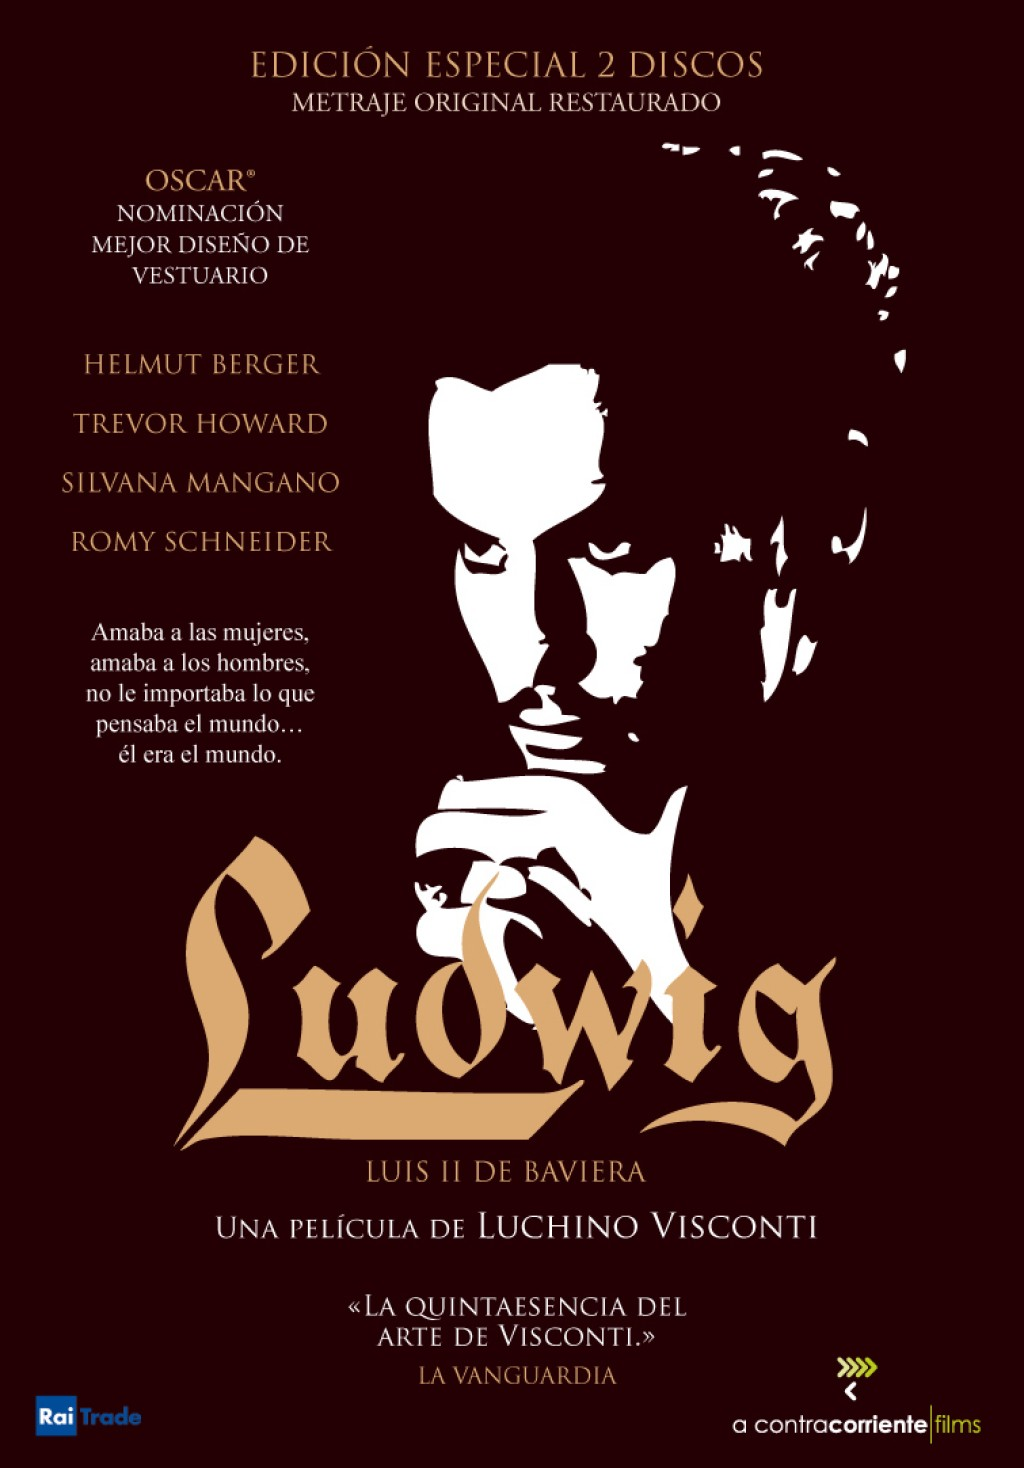 Ludwig, Luis II de Baviera